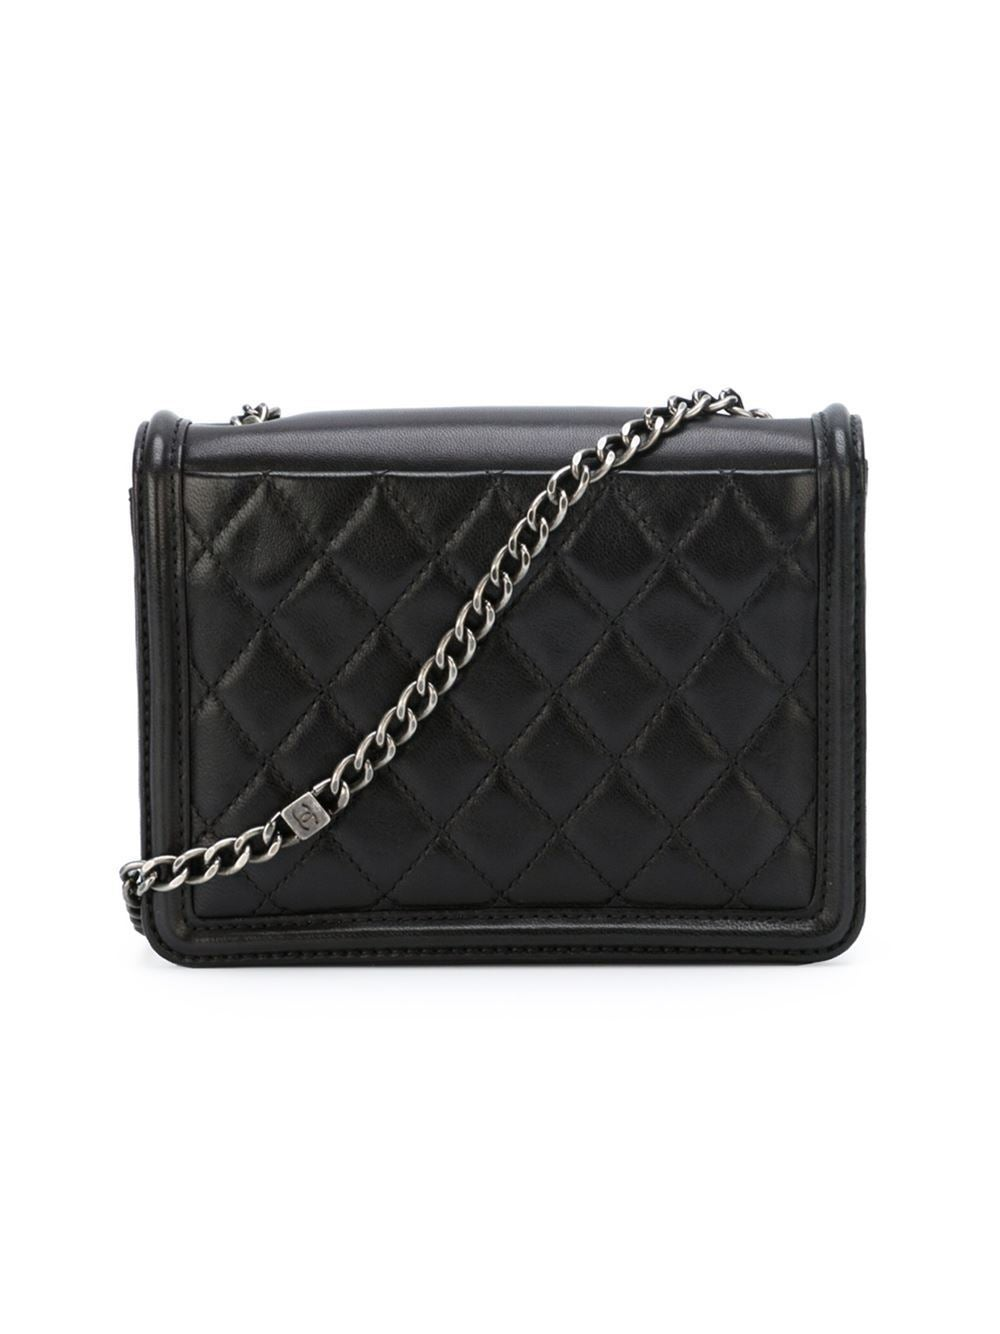 Chanel Lambskin Quot Boy Brick Quot Shoulder Bag At 1stdibs